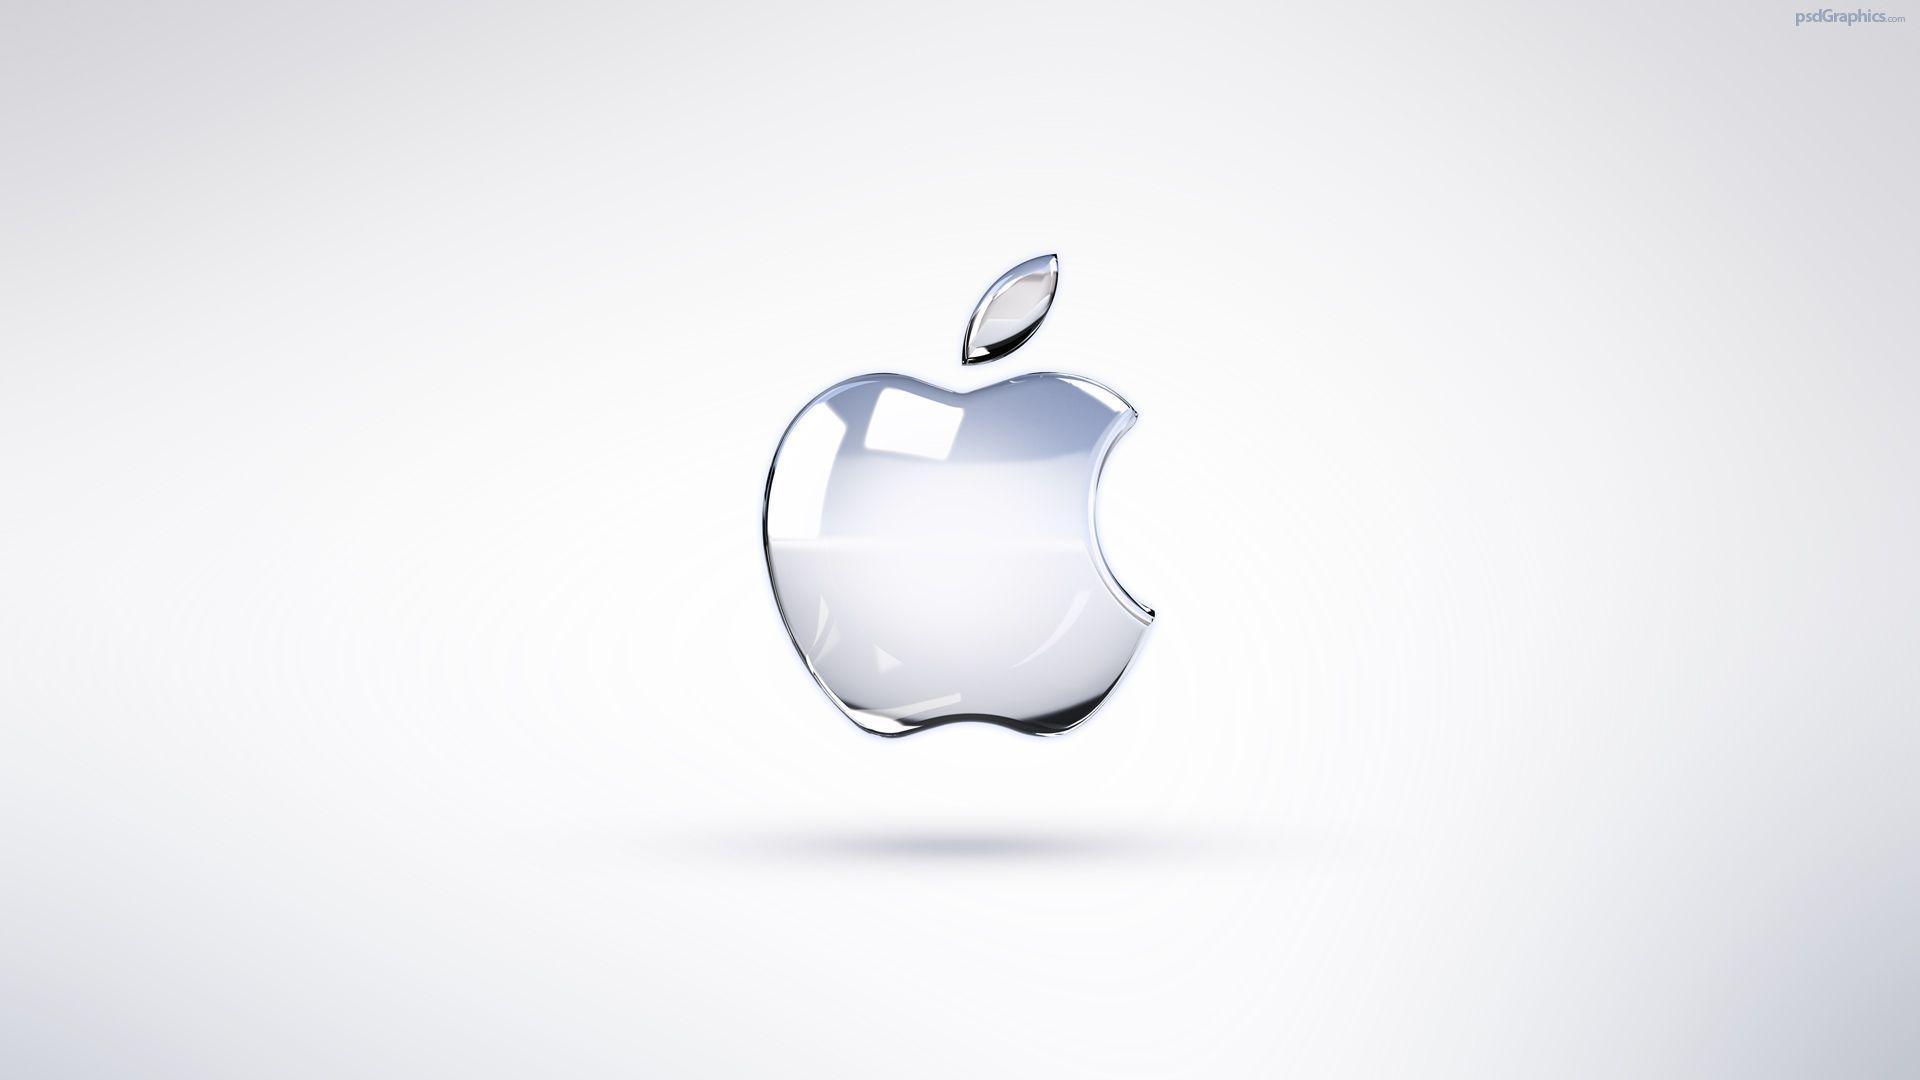 apple images wallpaper hd | animaxwallpaper